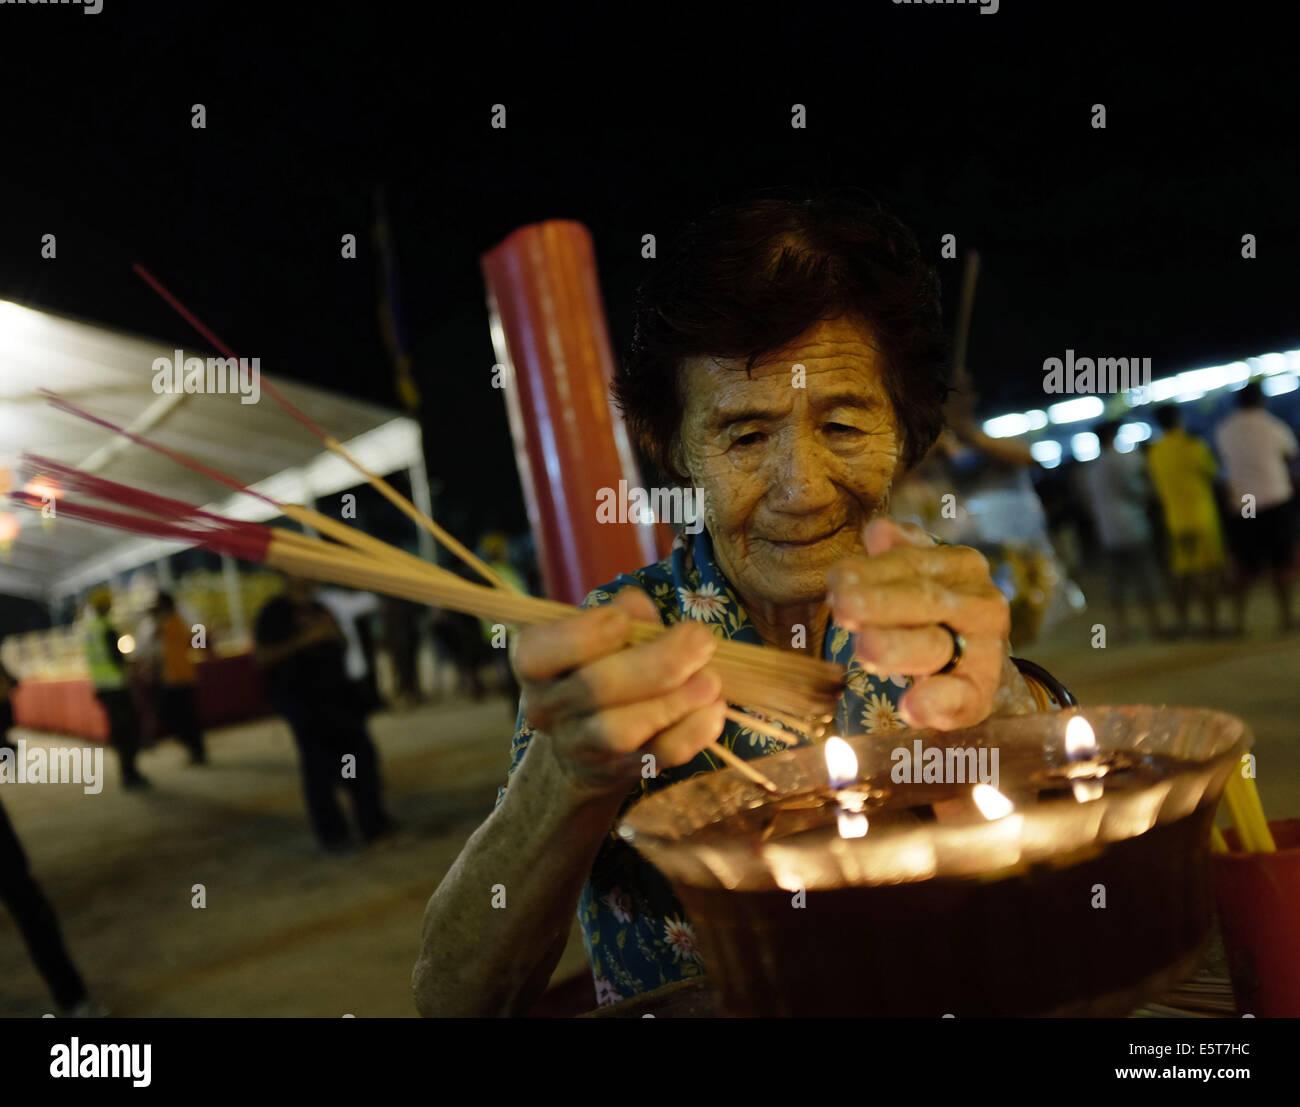 Kajang, SELANGOR, MALAYSIA. 5th Aug, 2014. An Ethnic Chinese devotee lights incense sticks during the festive event - Stock Image